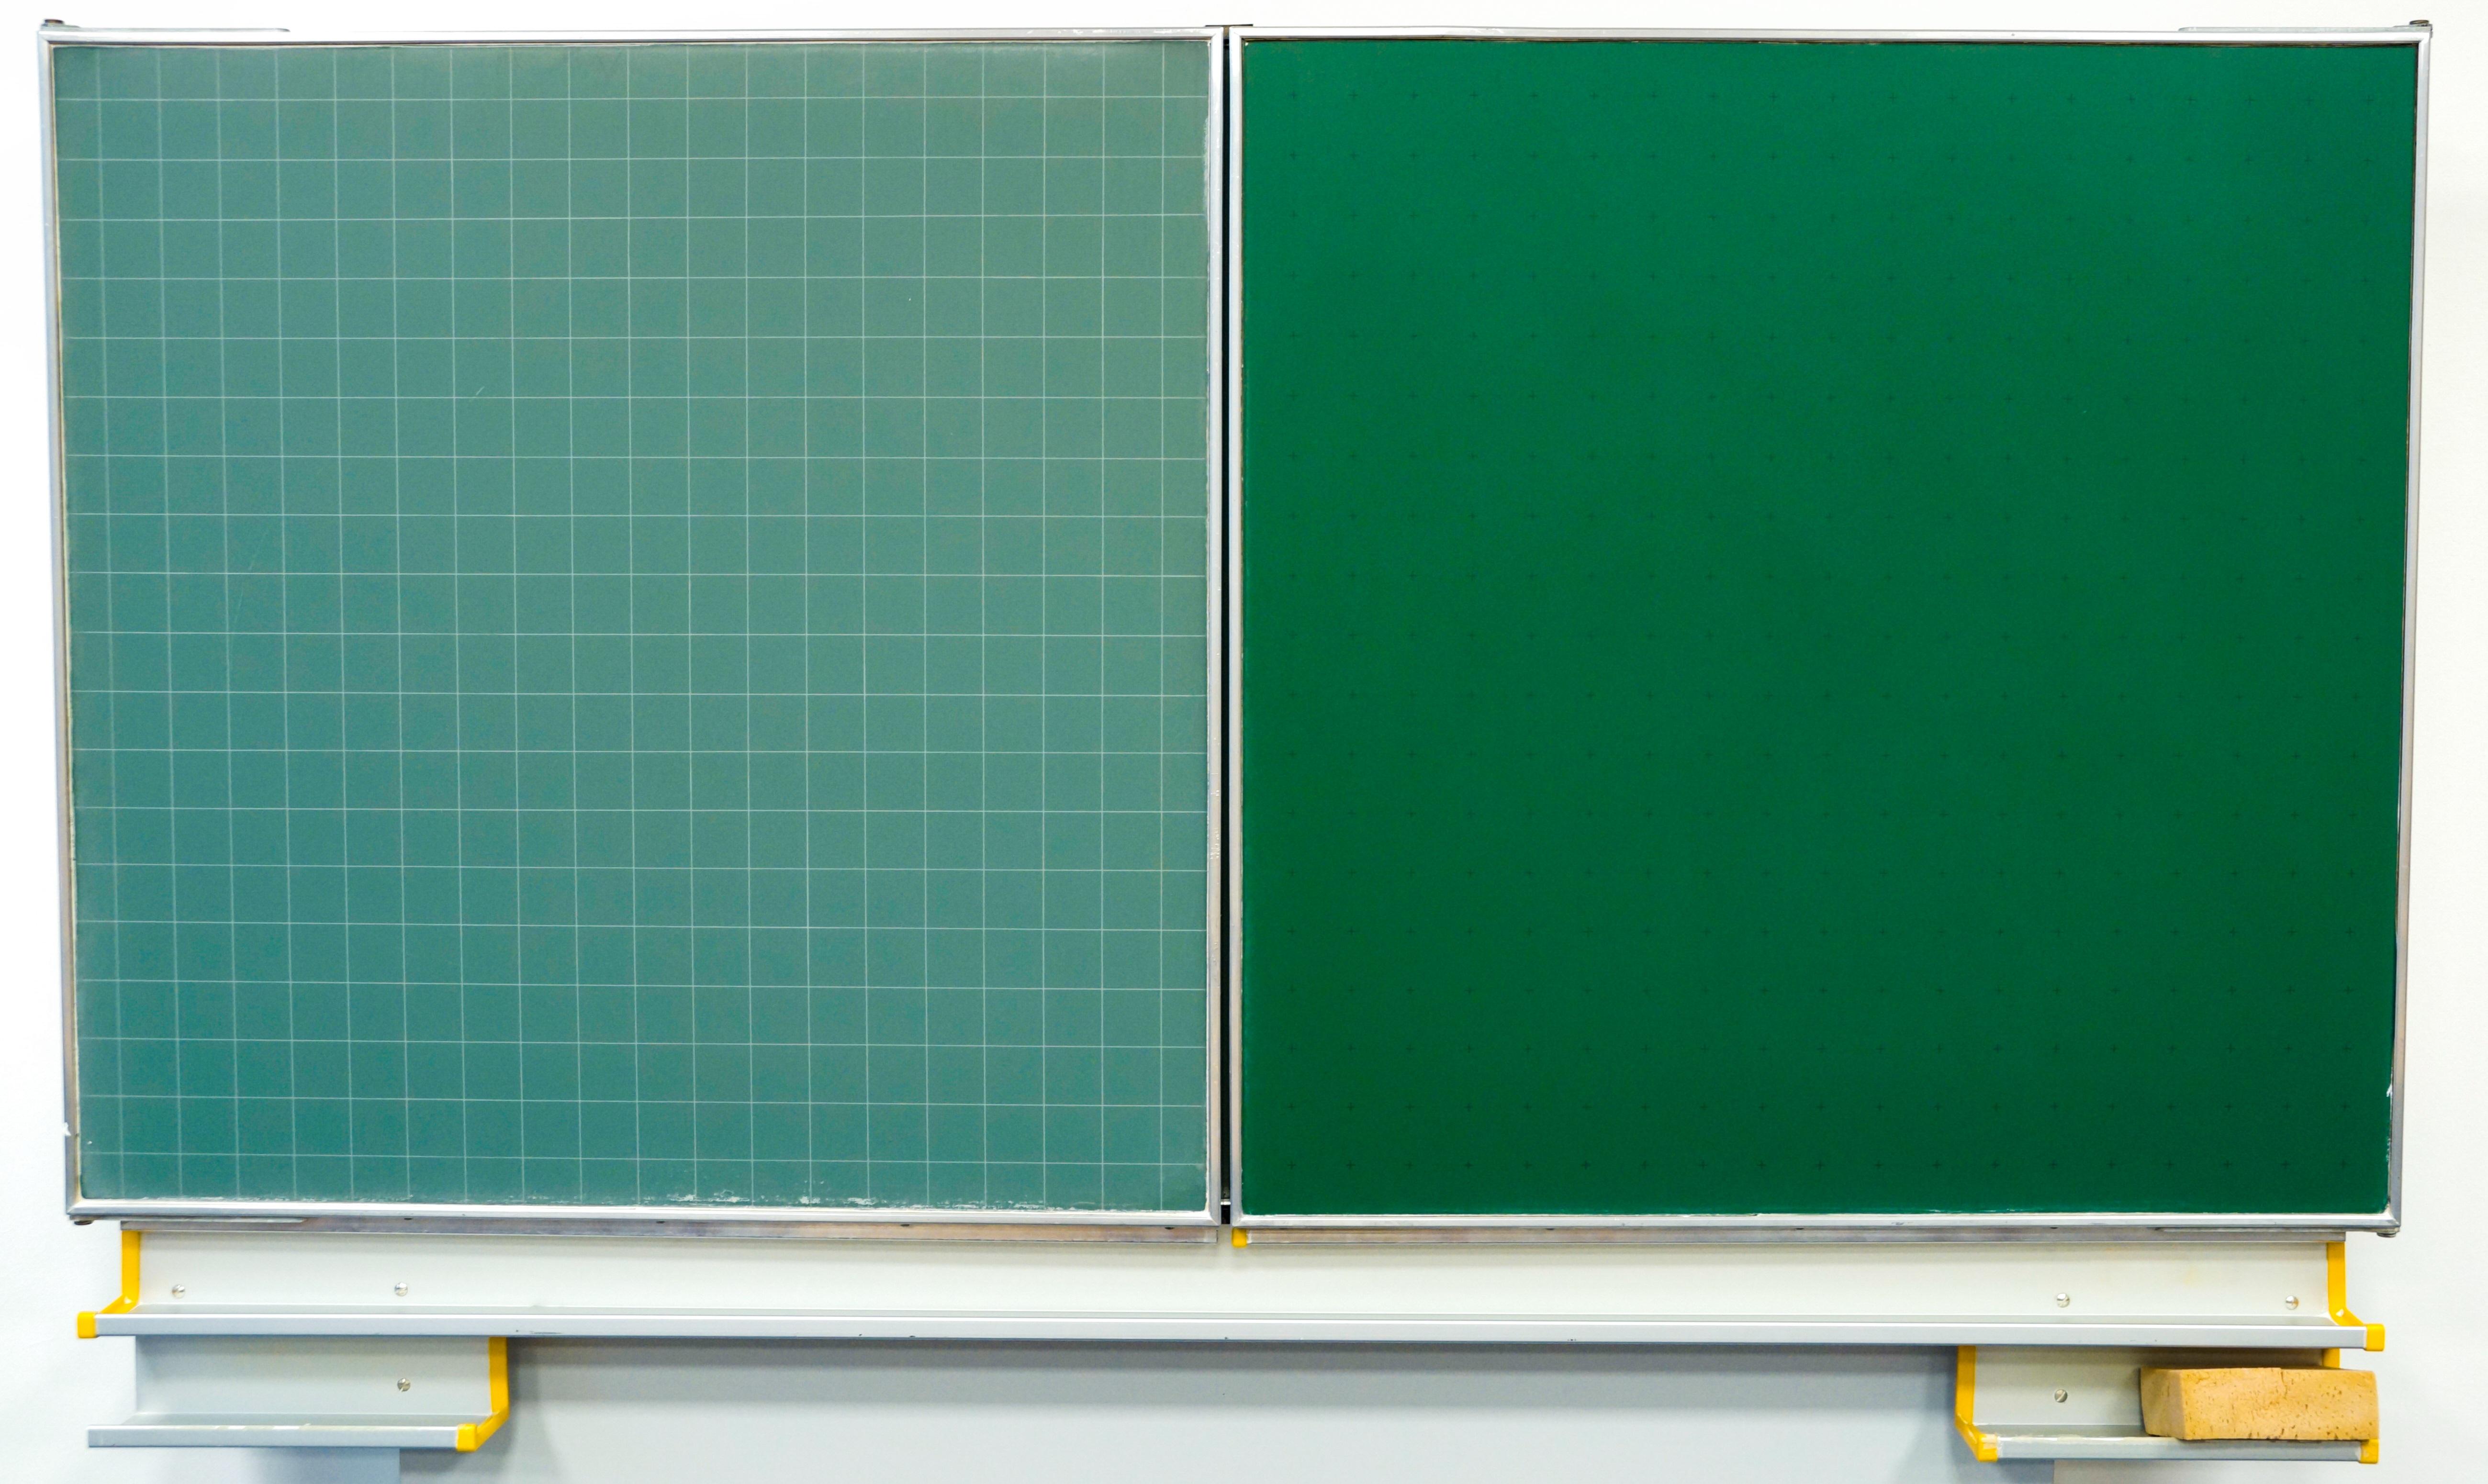 Classroom Blackboard Design ~ Free images board glass advertising green banner